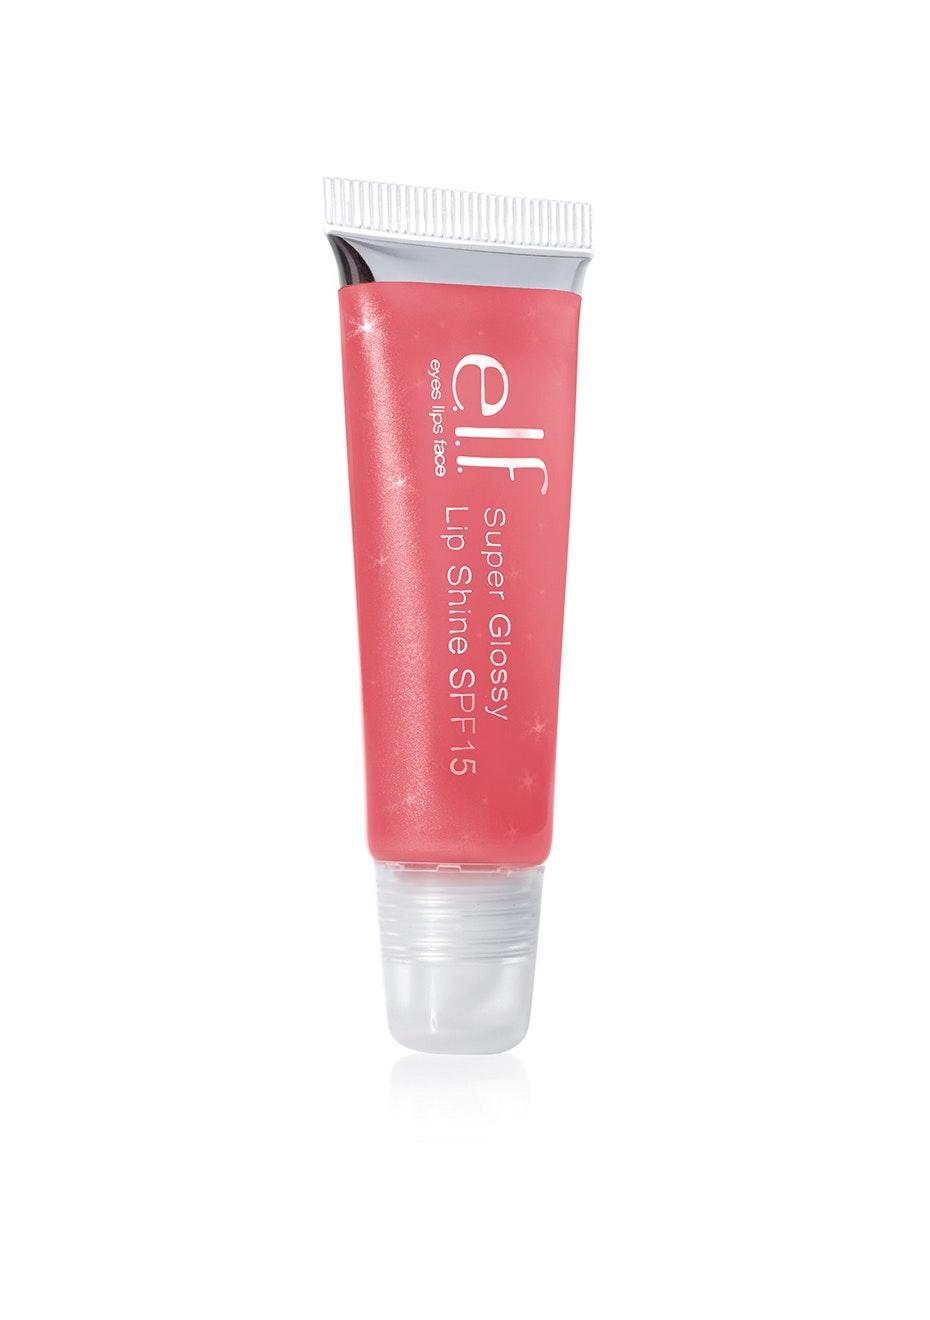 e.l.f Essentials Sup Gloss L/Shne Pink Pop 2824